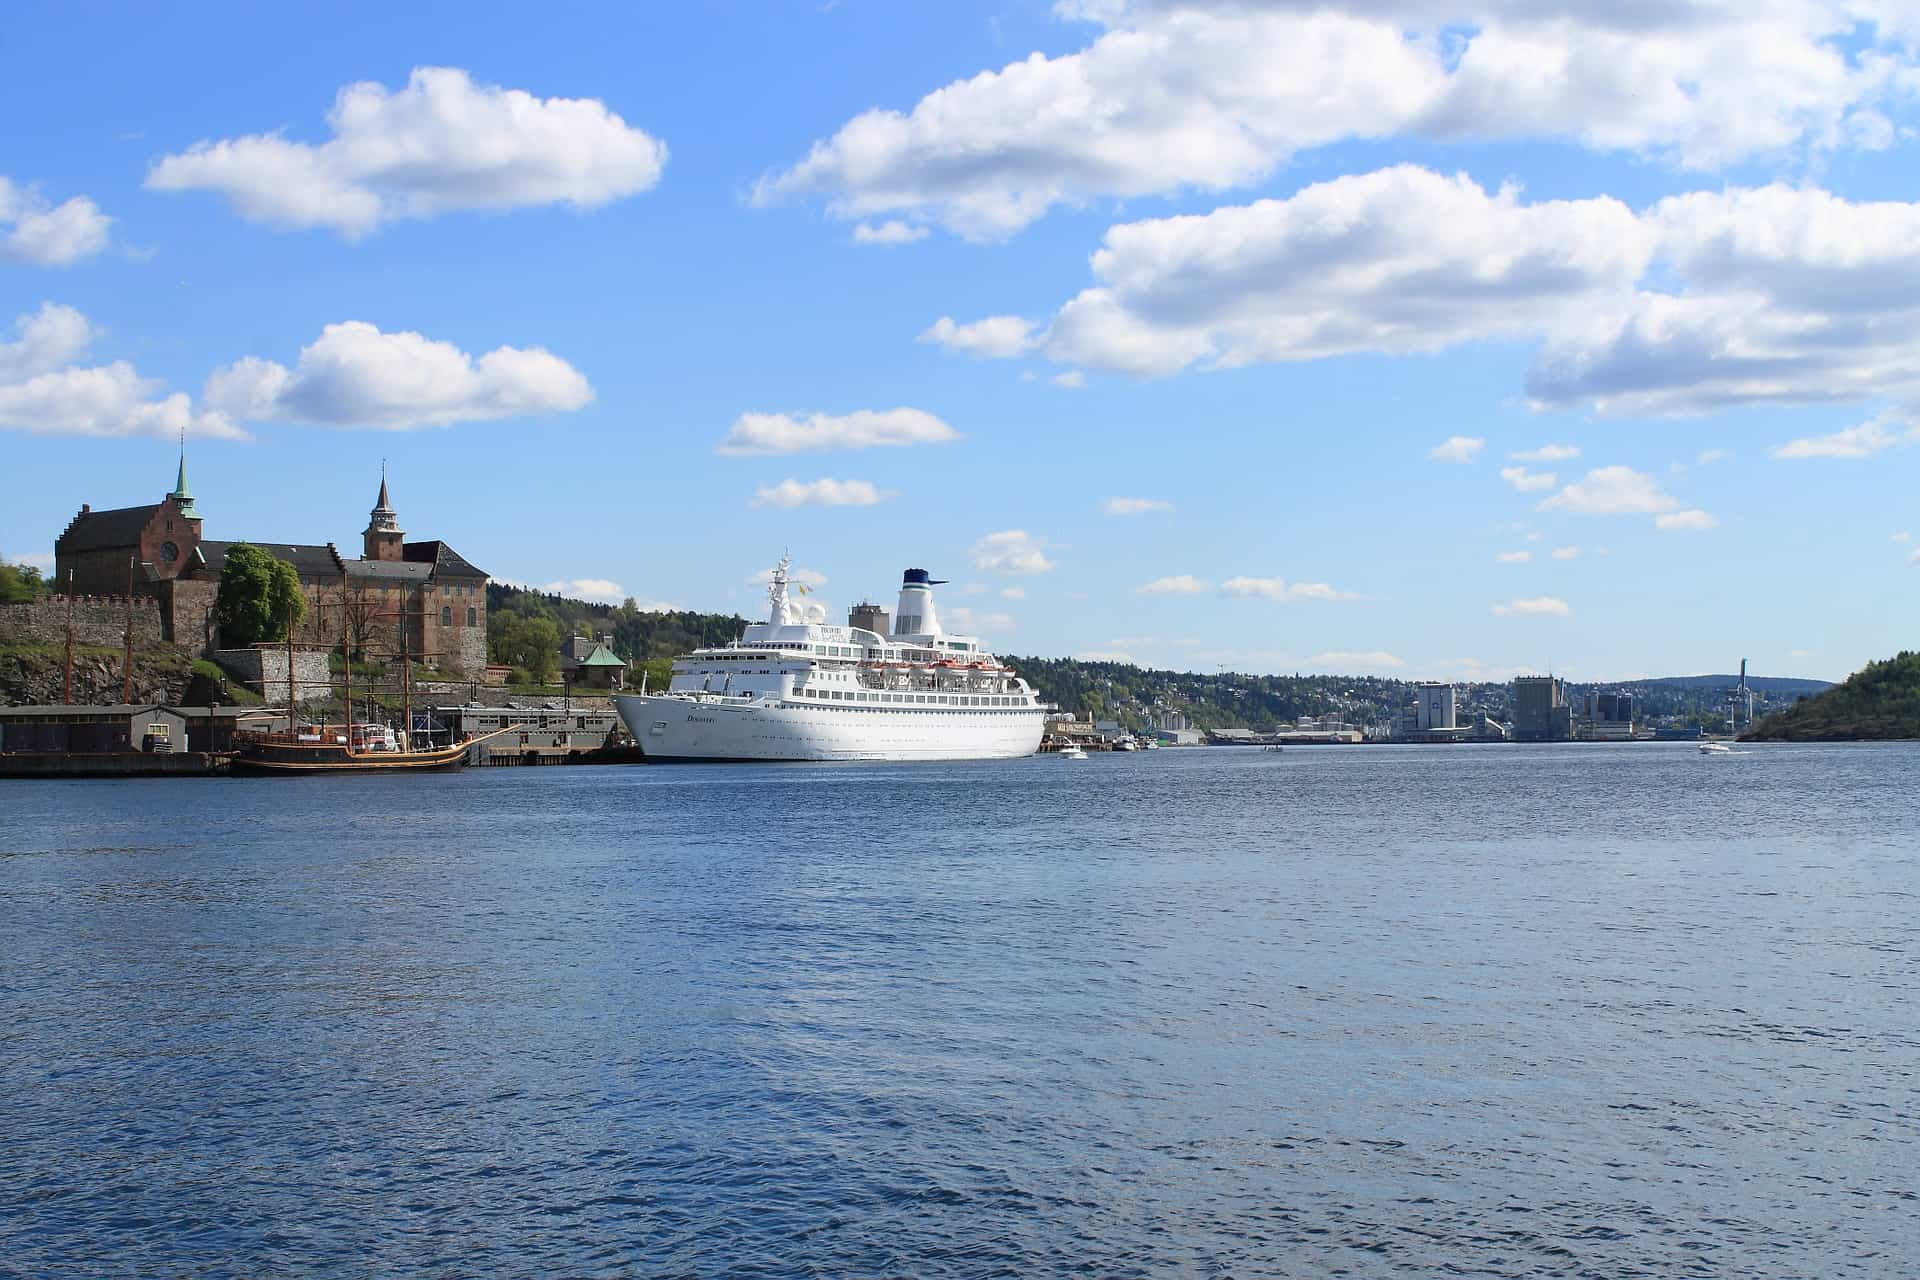 Kiel Minikreuzfahrt nach Oslo nur 79,00€ 3 Tage Ostsee